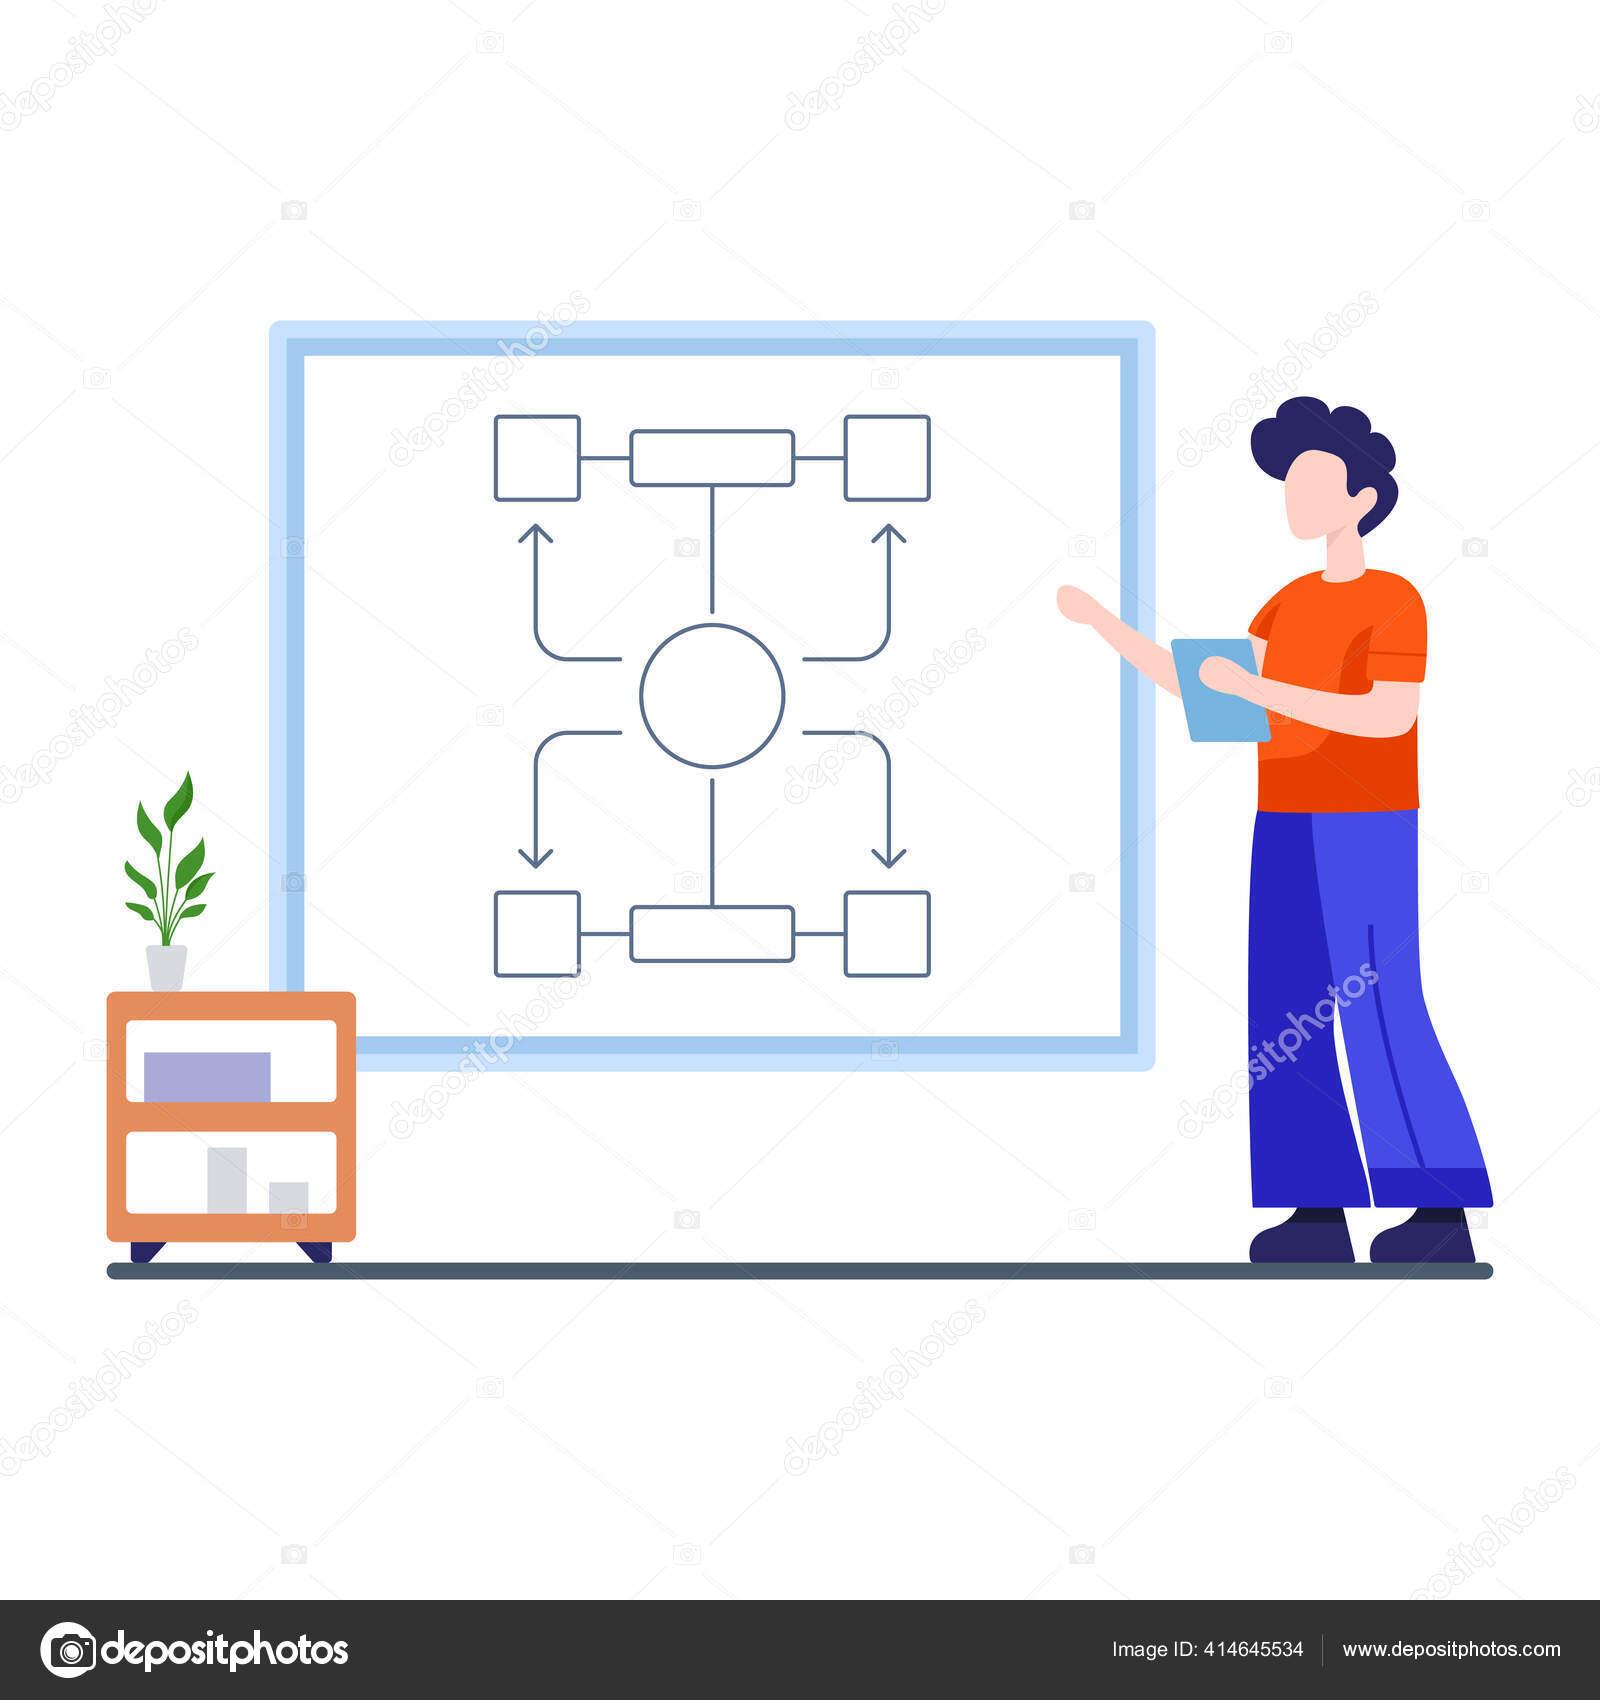 Flowchart Diagram Represents Algorithm Workflow Process Flat Illustration Stock Vector C Smashingstocks 414645534